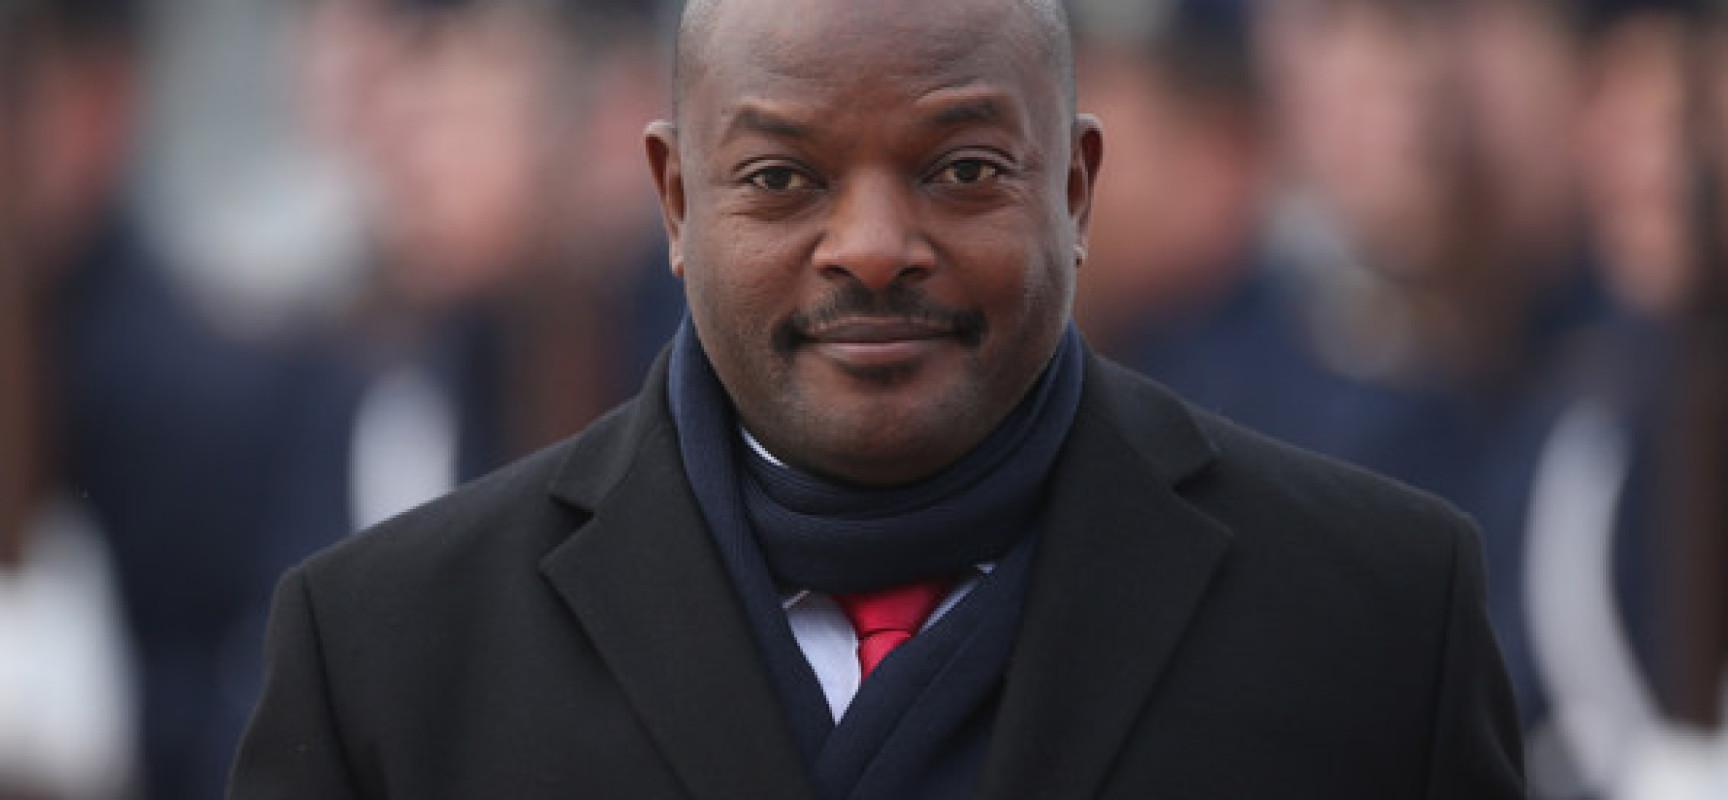 Pierre Nkurunziza Credit - www.vozempire.com